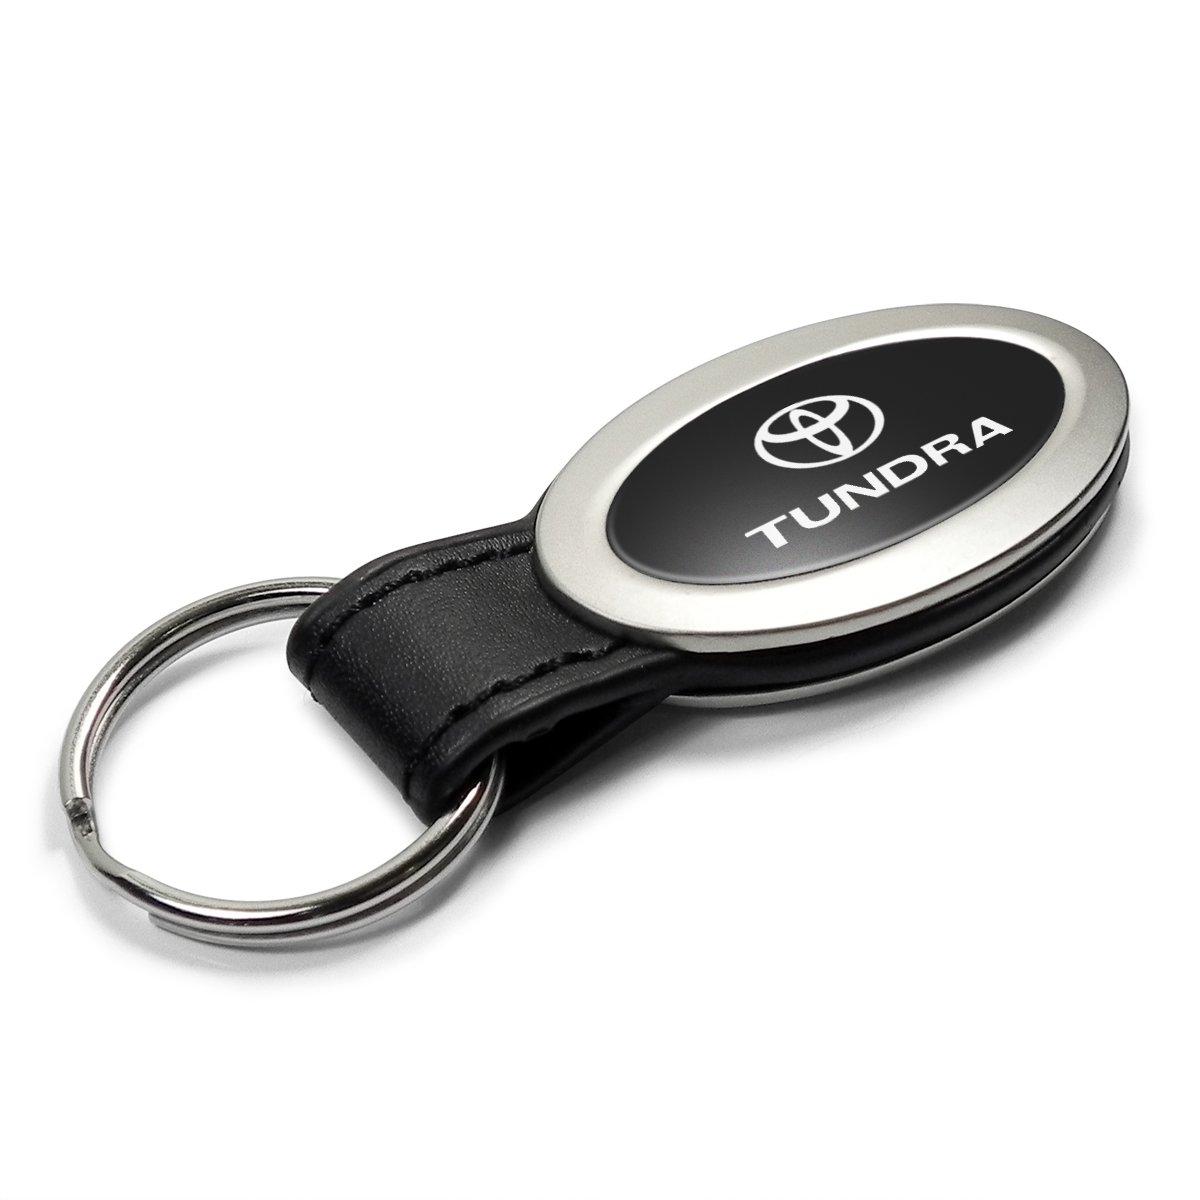 Toyota Tundra Oval Style Metal Key Chain Key Fob